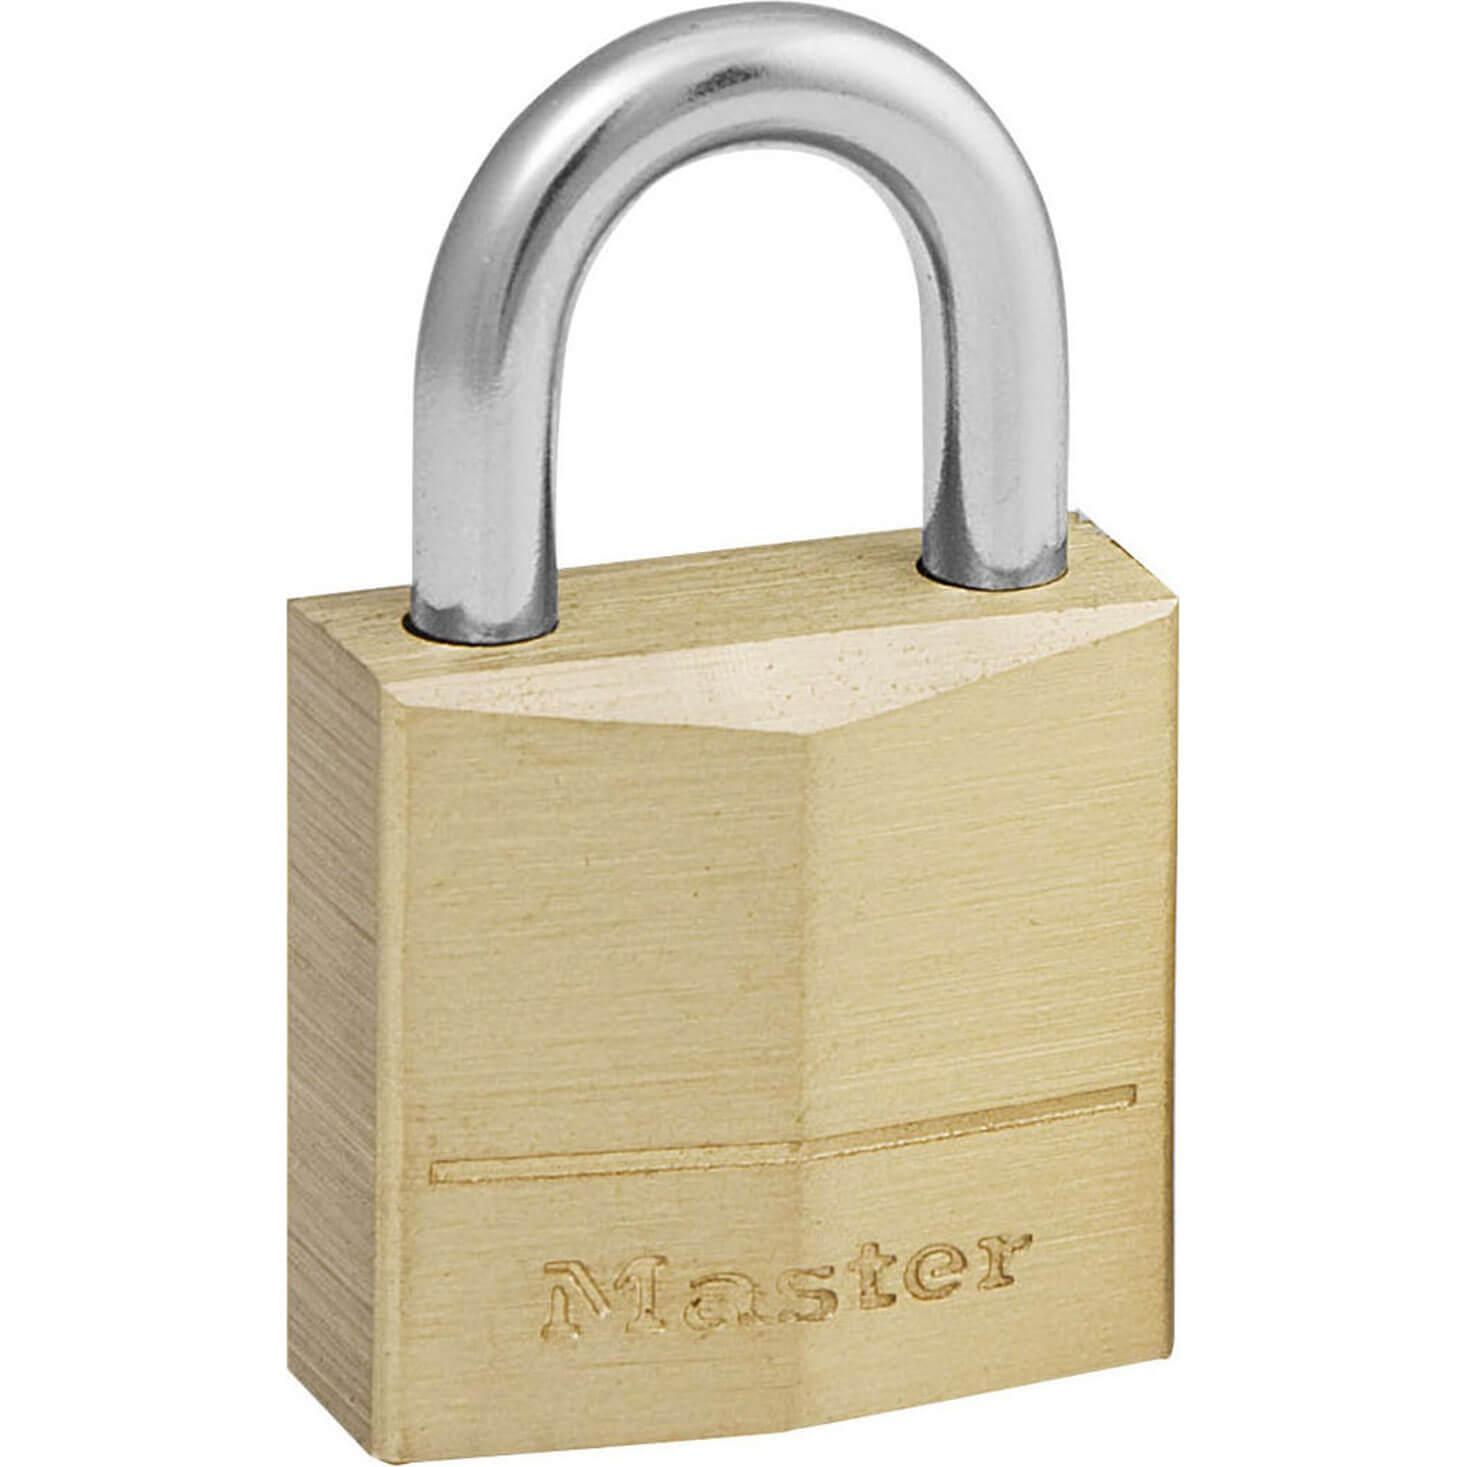 Tooled Up/Ironmongery & Security/Security/Masterlock 20mm Solid Brass Padlock